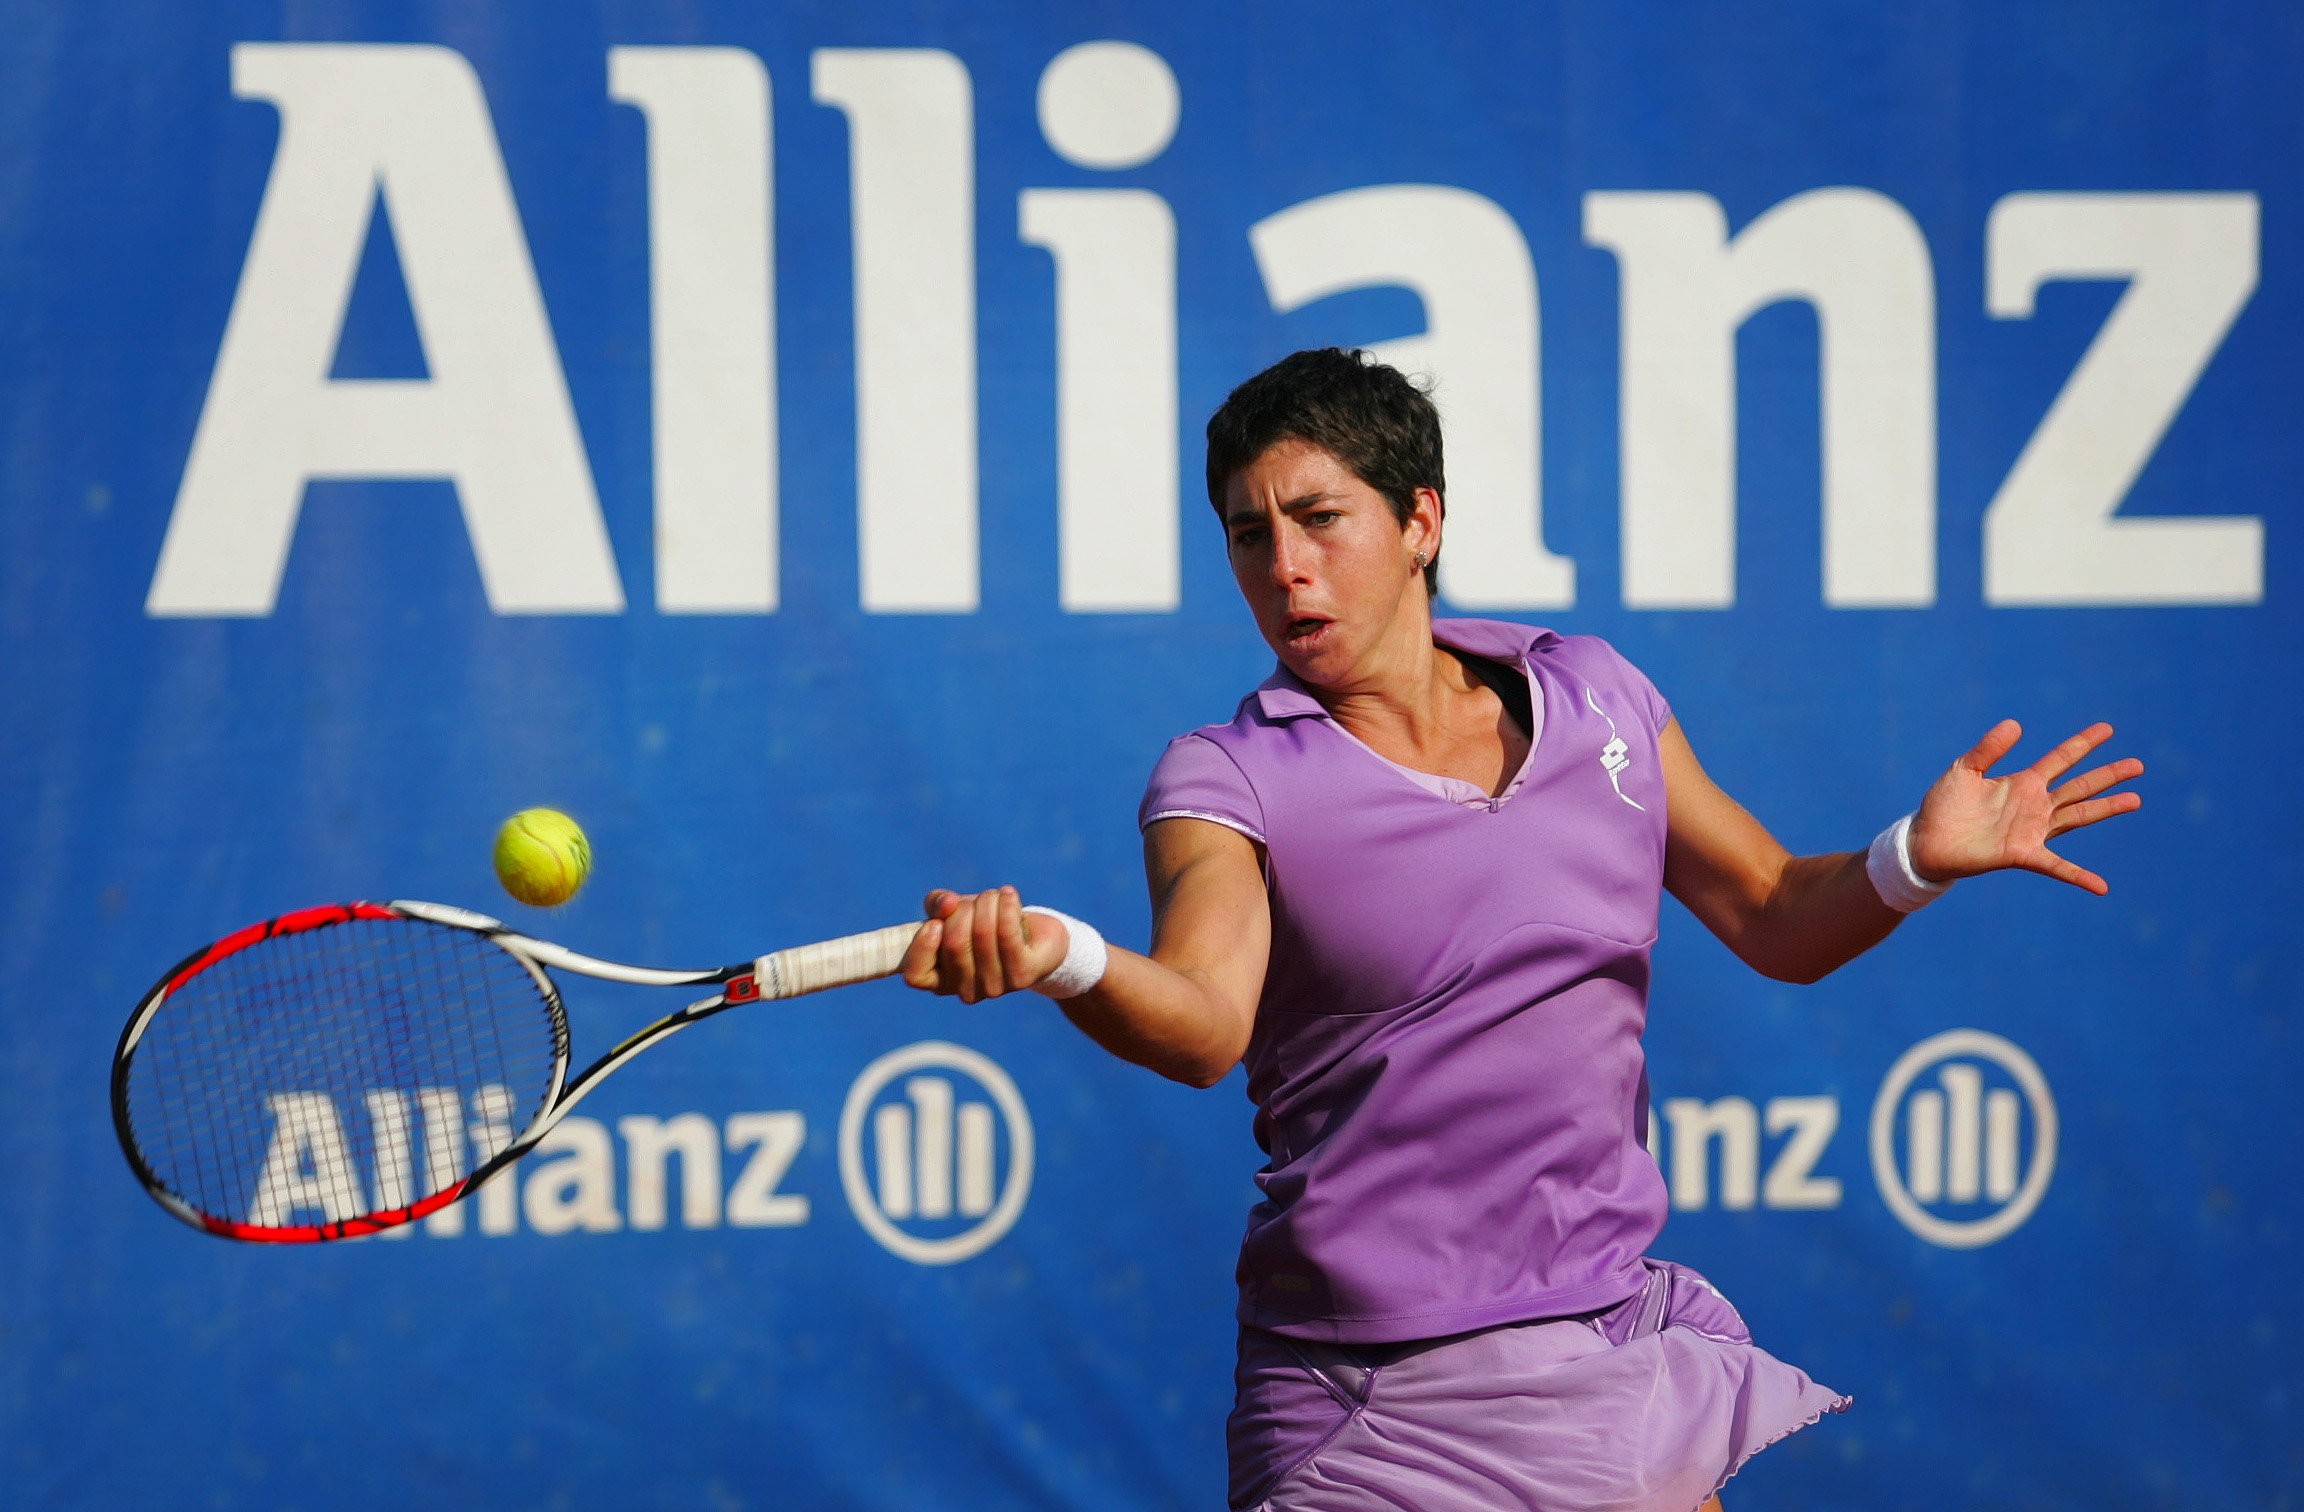 Карла Суарес Наваро тръгна с победа